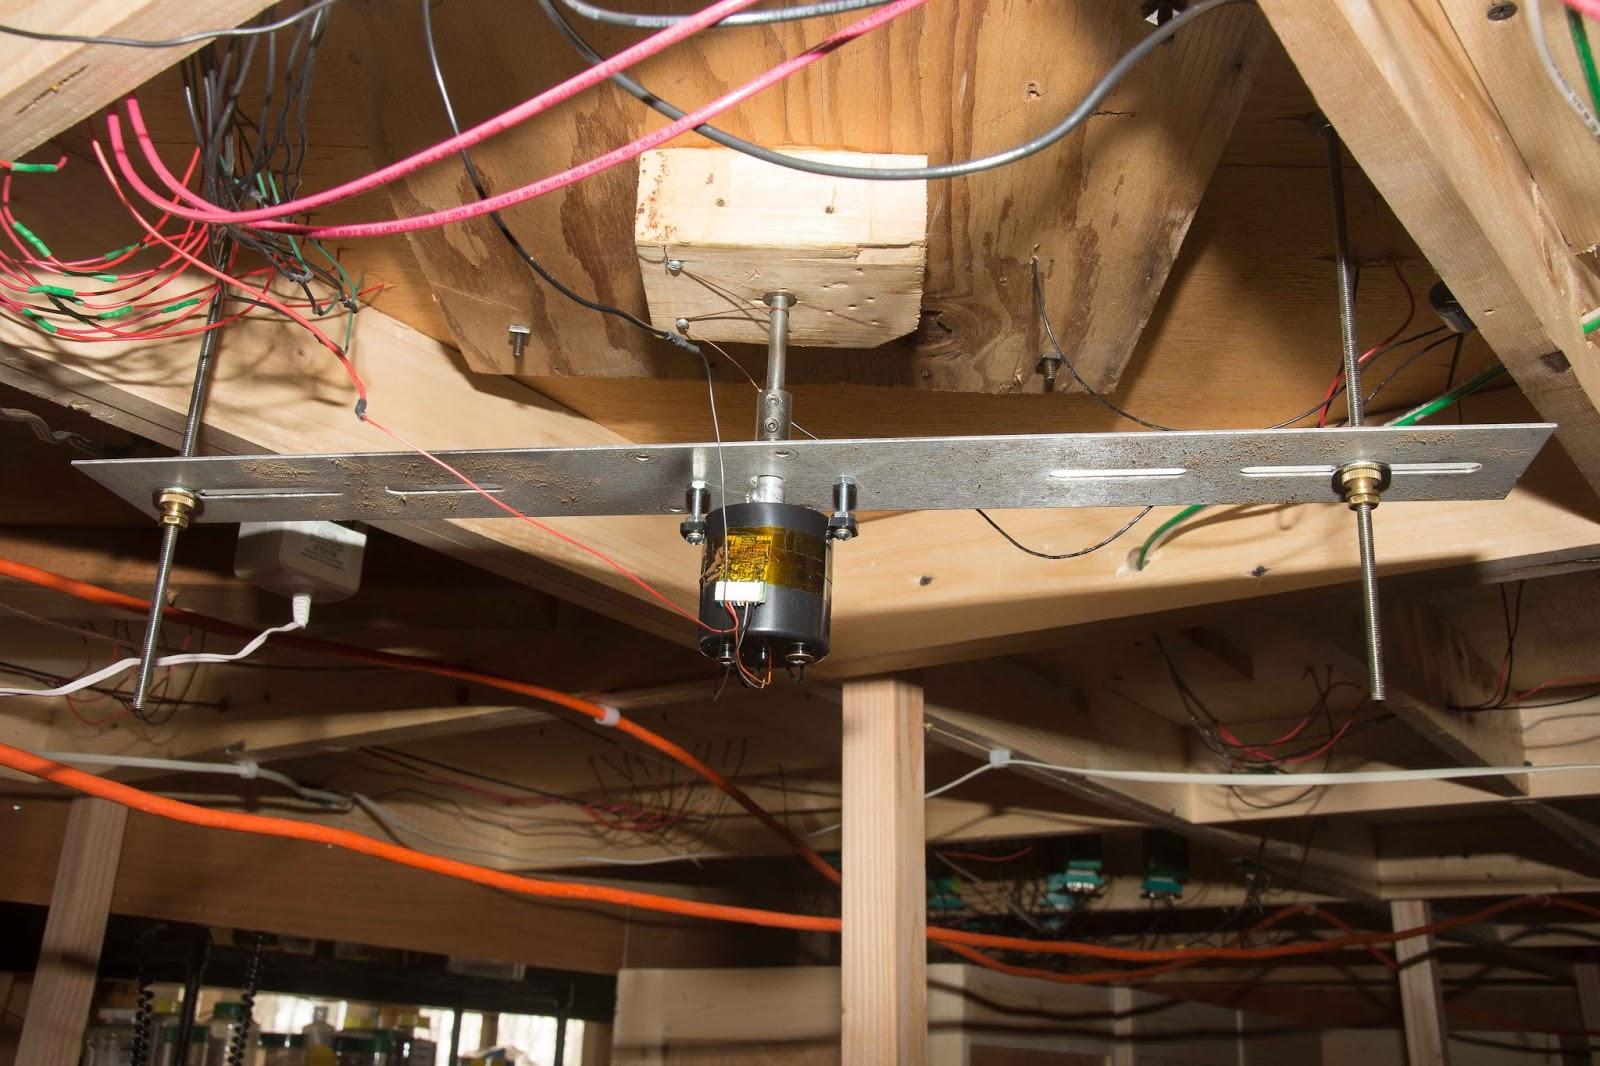 medium resolution of modeling colorado narrow gauge in hon3 turntable control using dcc single track wiring model train dcc wiring turntable